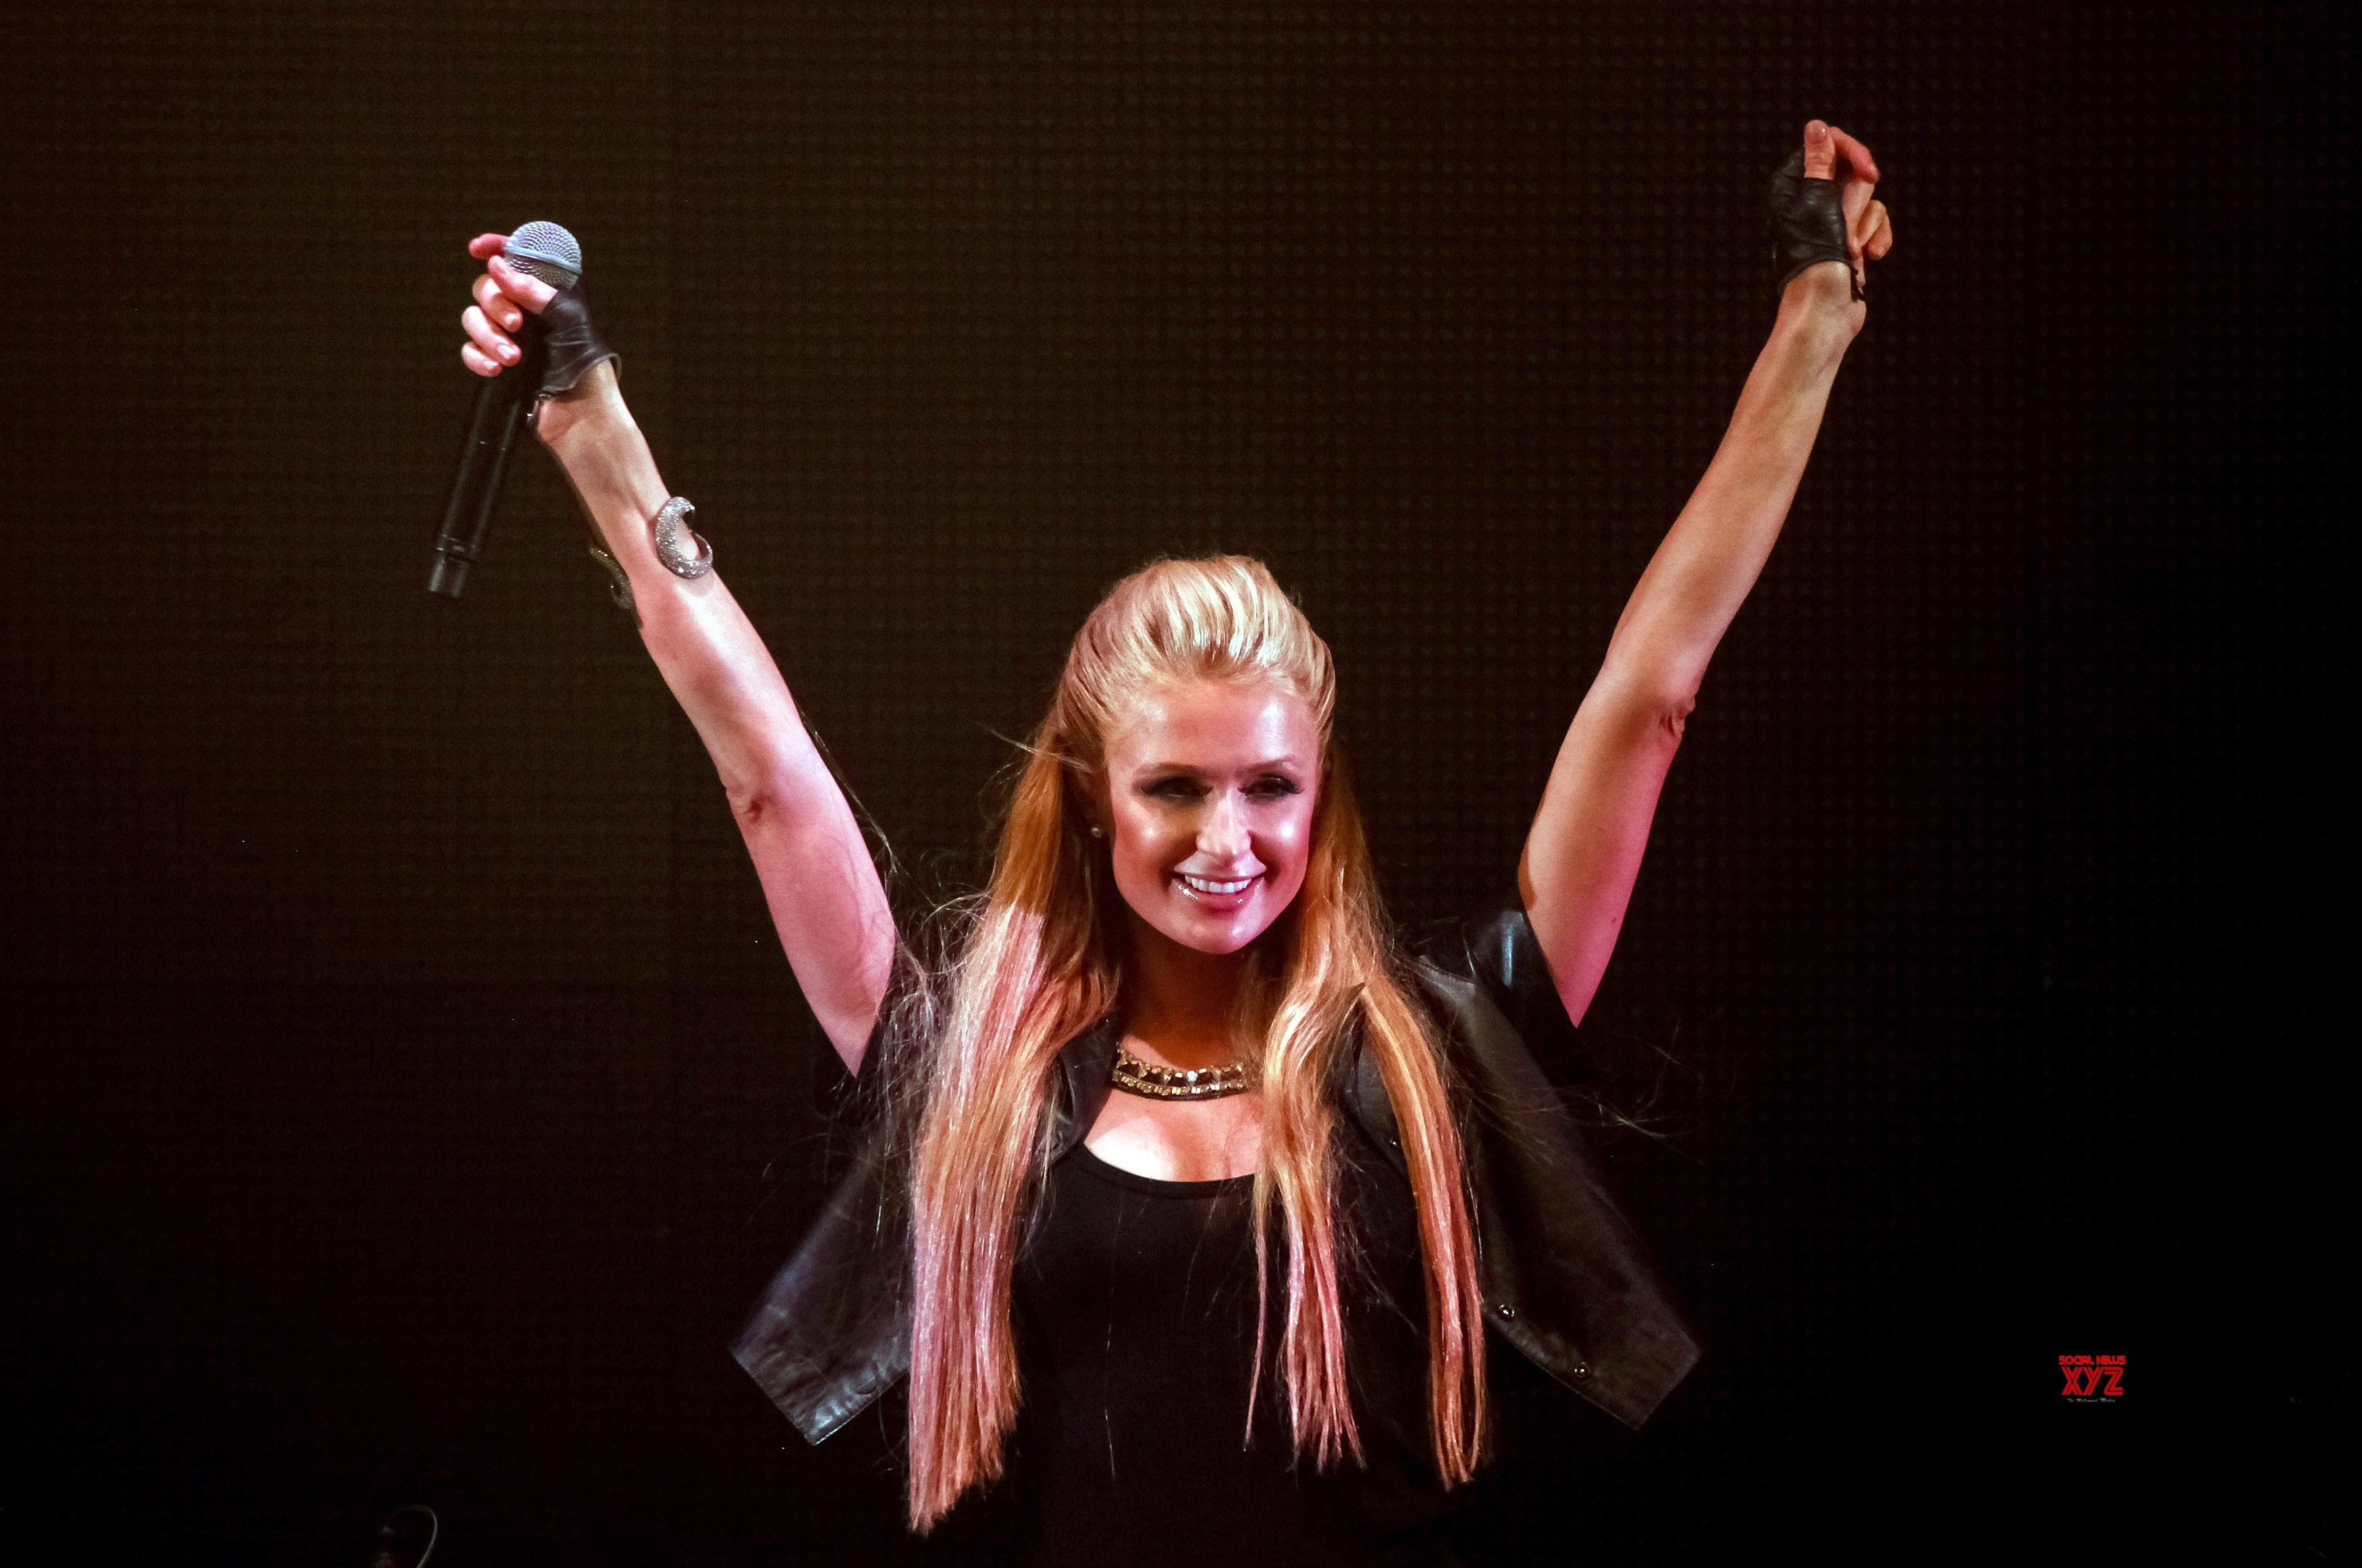 Paris Hilton calls Lindsay Lohan lame, embarrassing